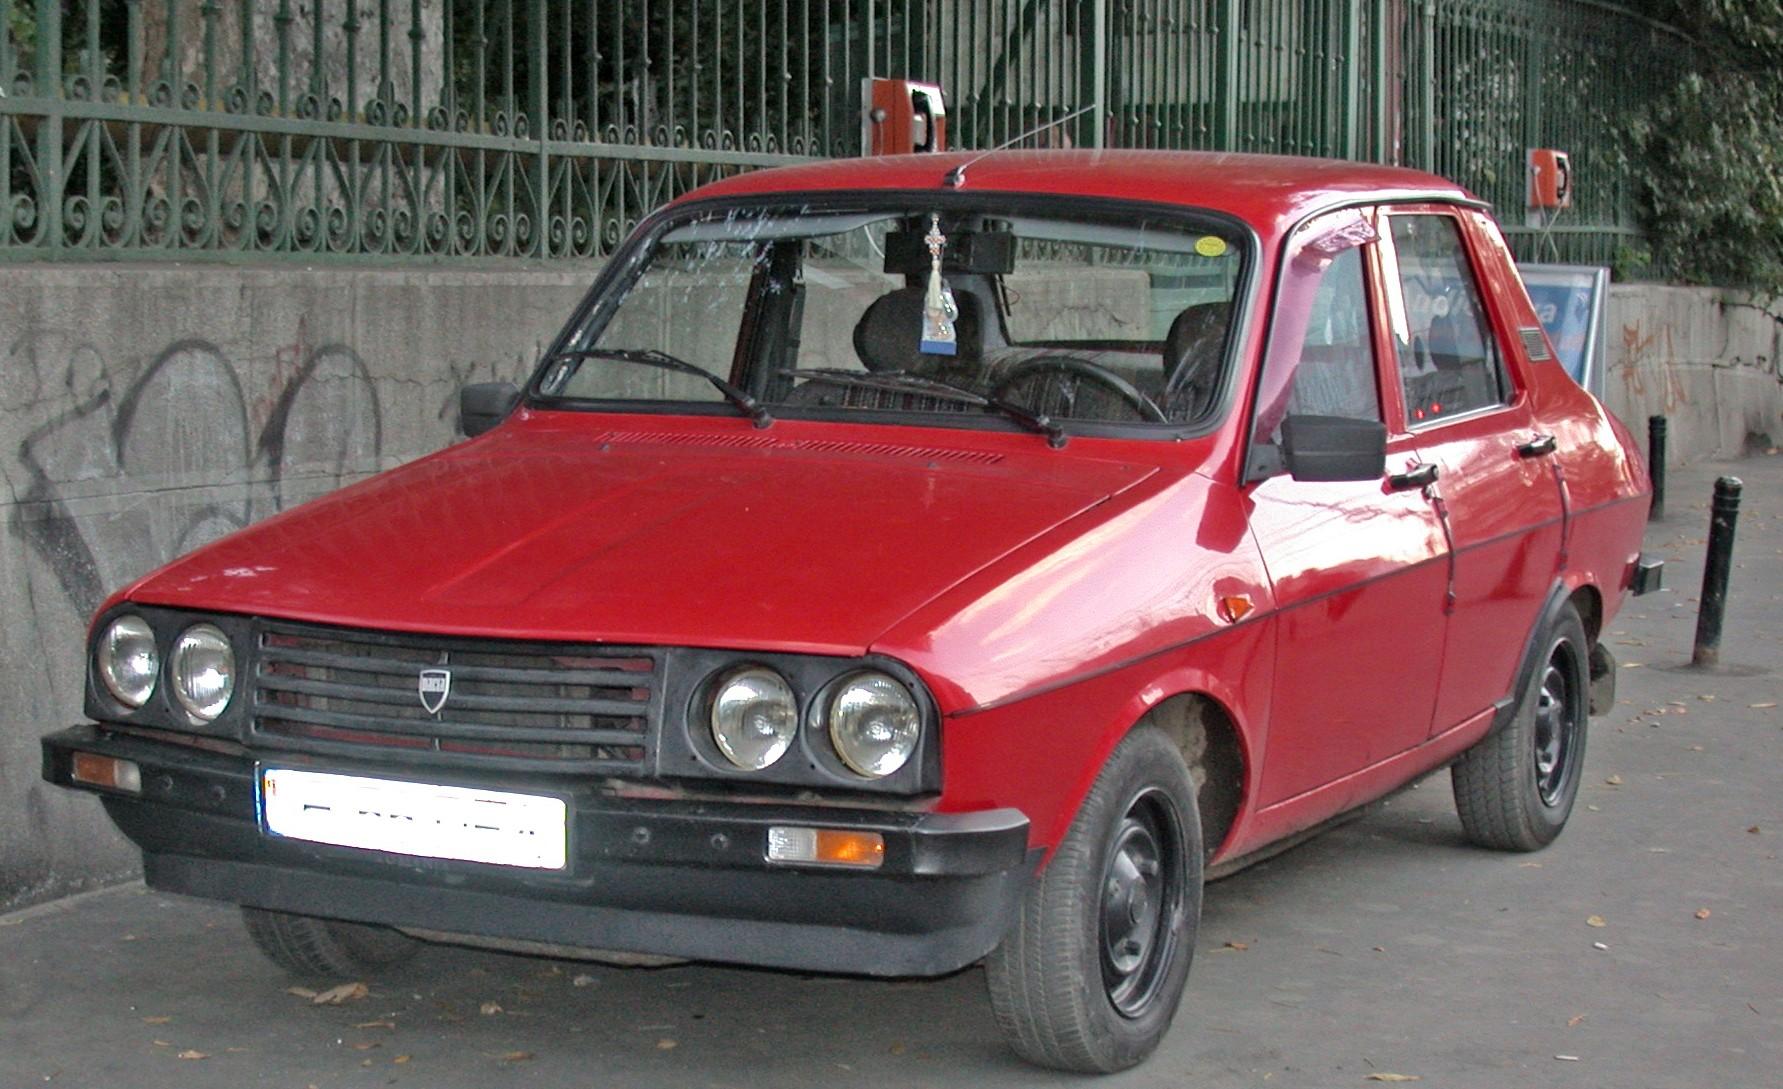 Dacia 1310 1984 1985 1986 1987 1988 1989 1990